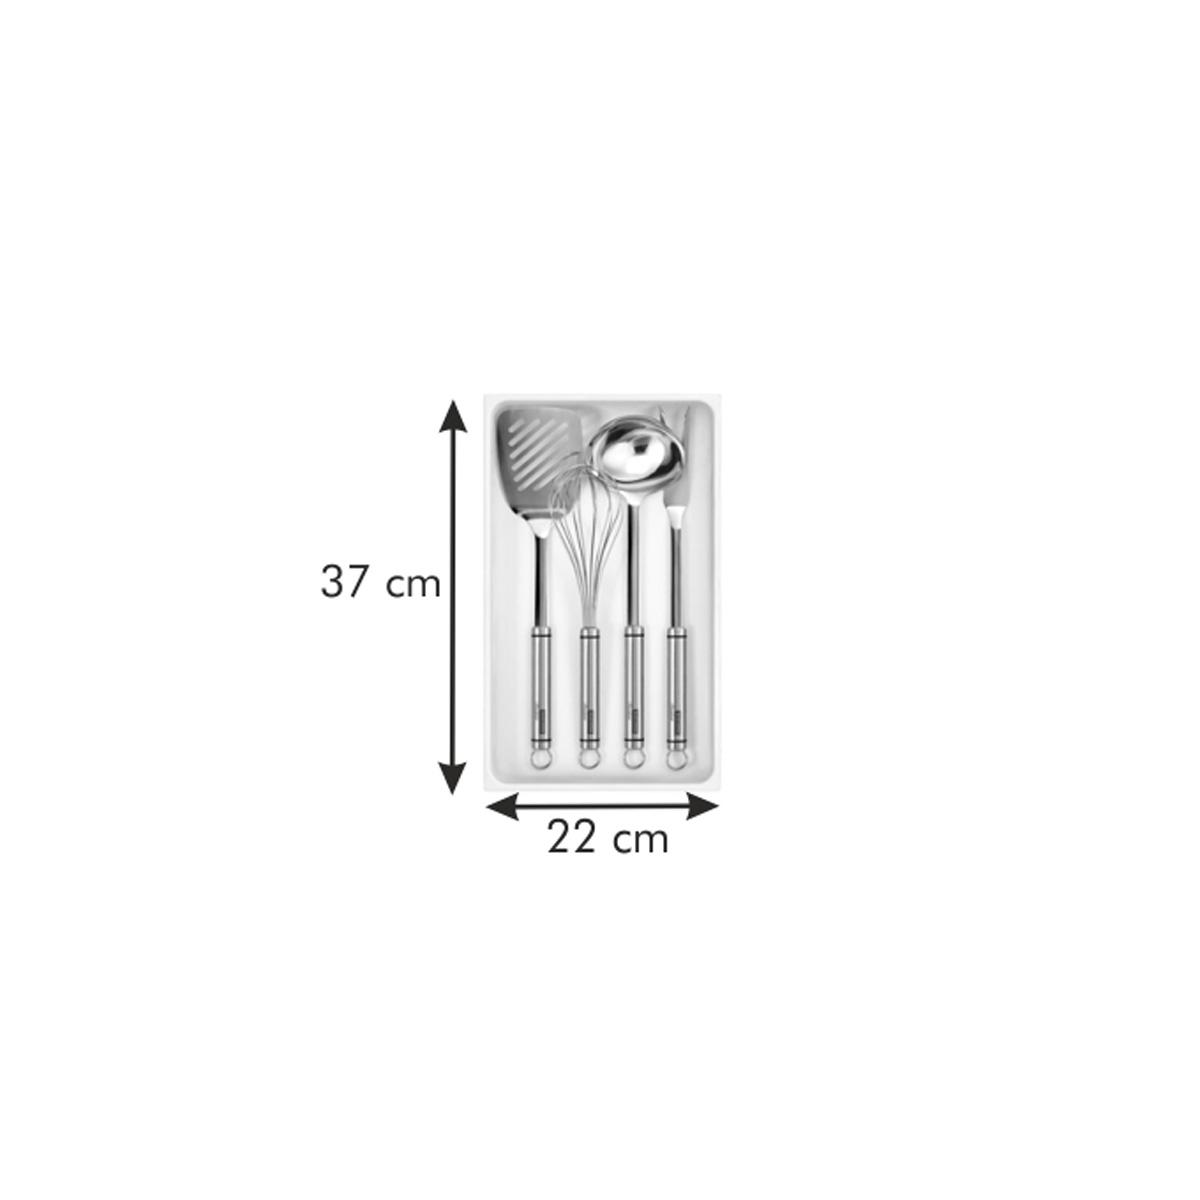 Zásobník FlexiSPACE 370x222 mm